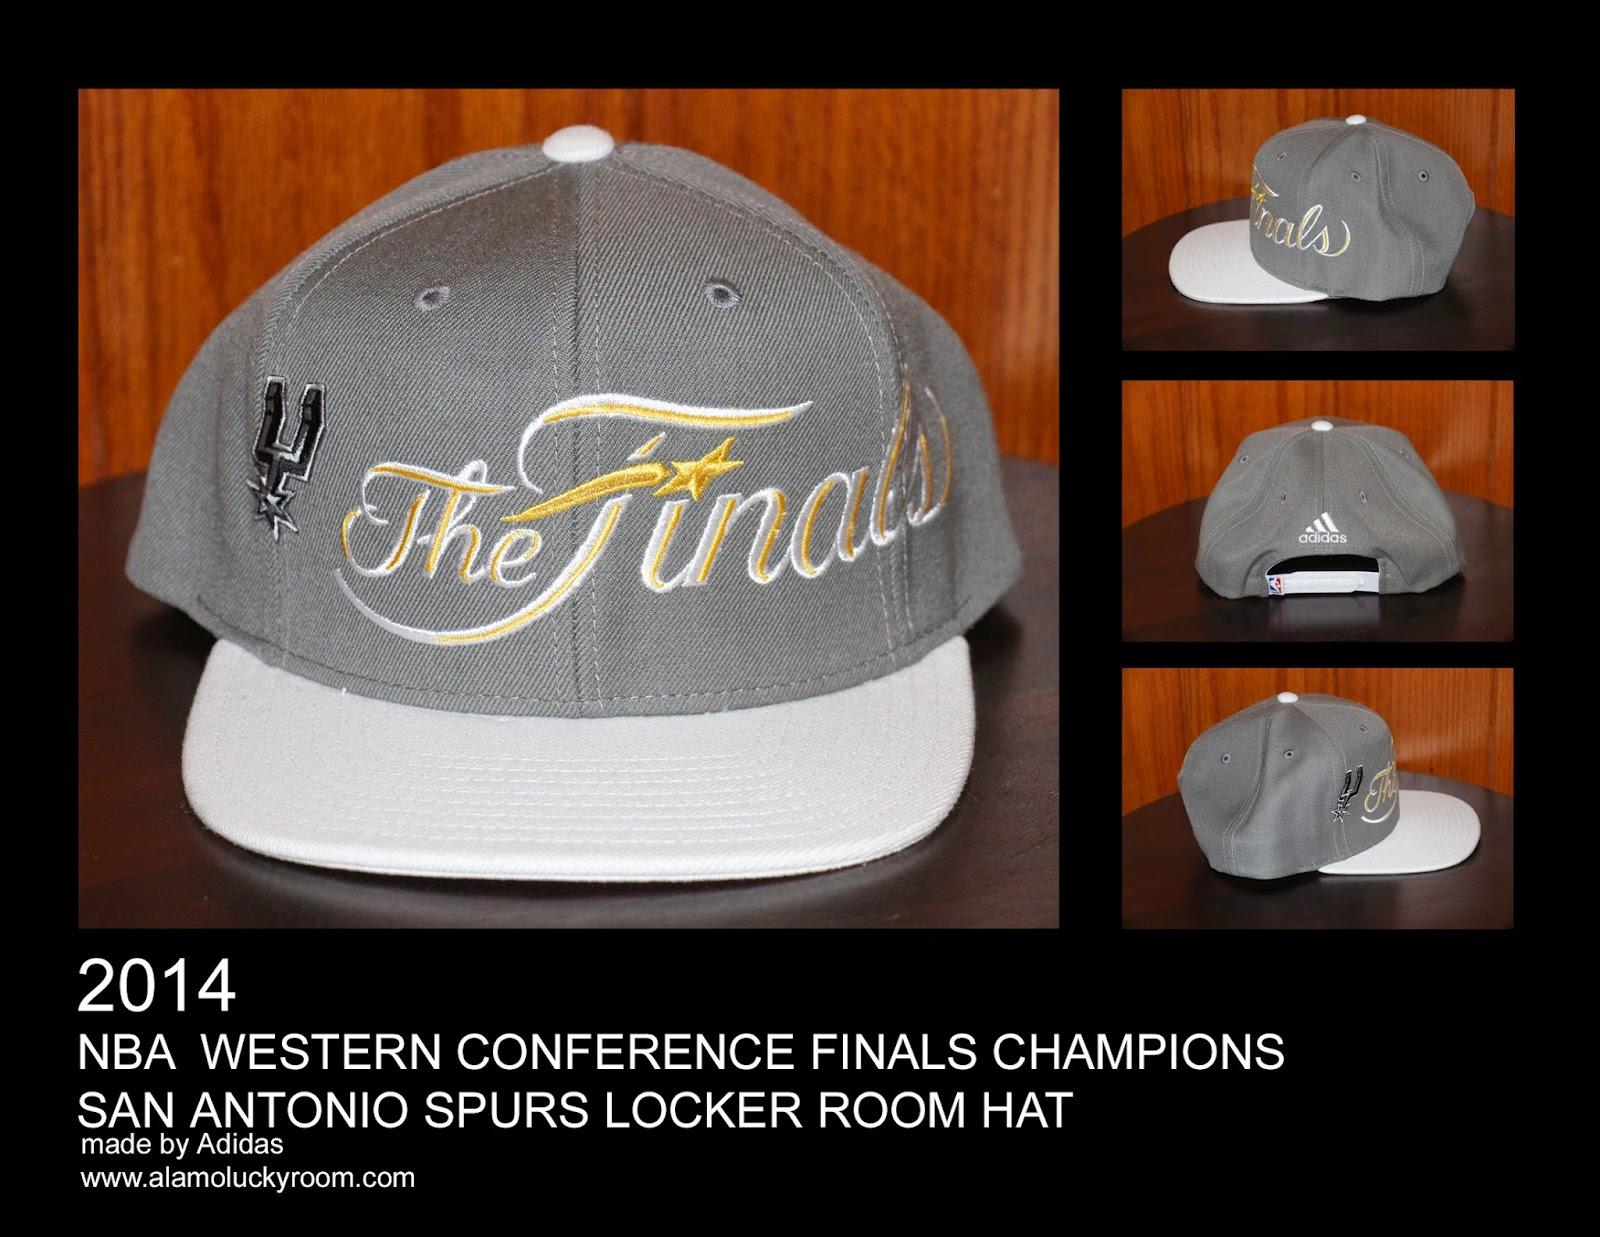 445d256a18b 2014 San Antonio Spurs NBA Western Conference Finals Champions Locker Room  Hat